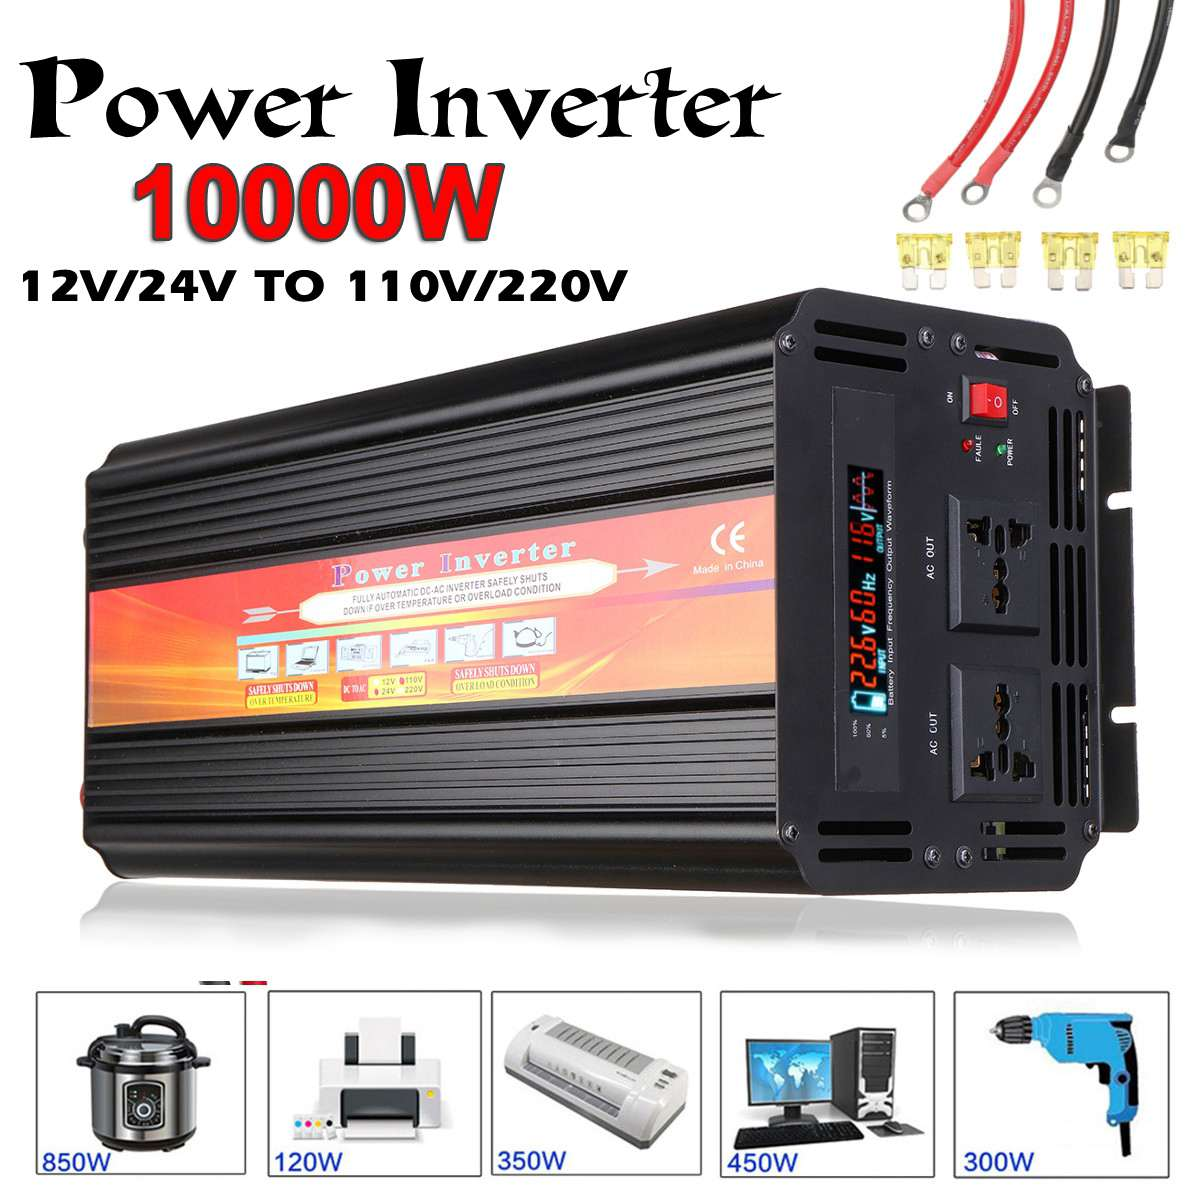 Inverter 12V 220V 6000W 10000W Pea k Power Inverter Voltage Converter Transformer DC 12V/24V To AC 110V/220V Solar Inversor 1pcs lot sh b17 50w 220v to 110v 110v to 220v